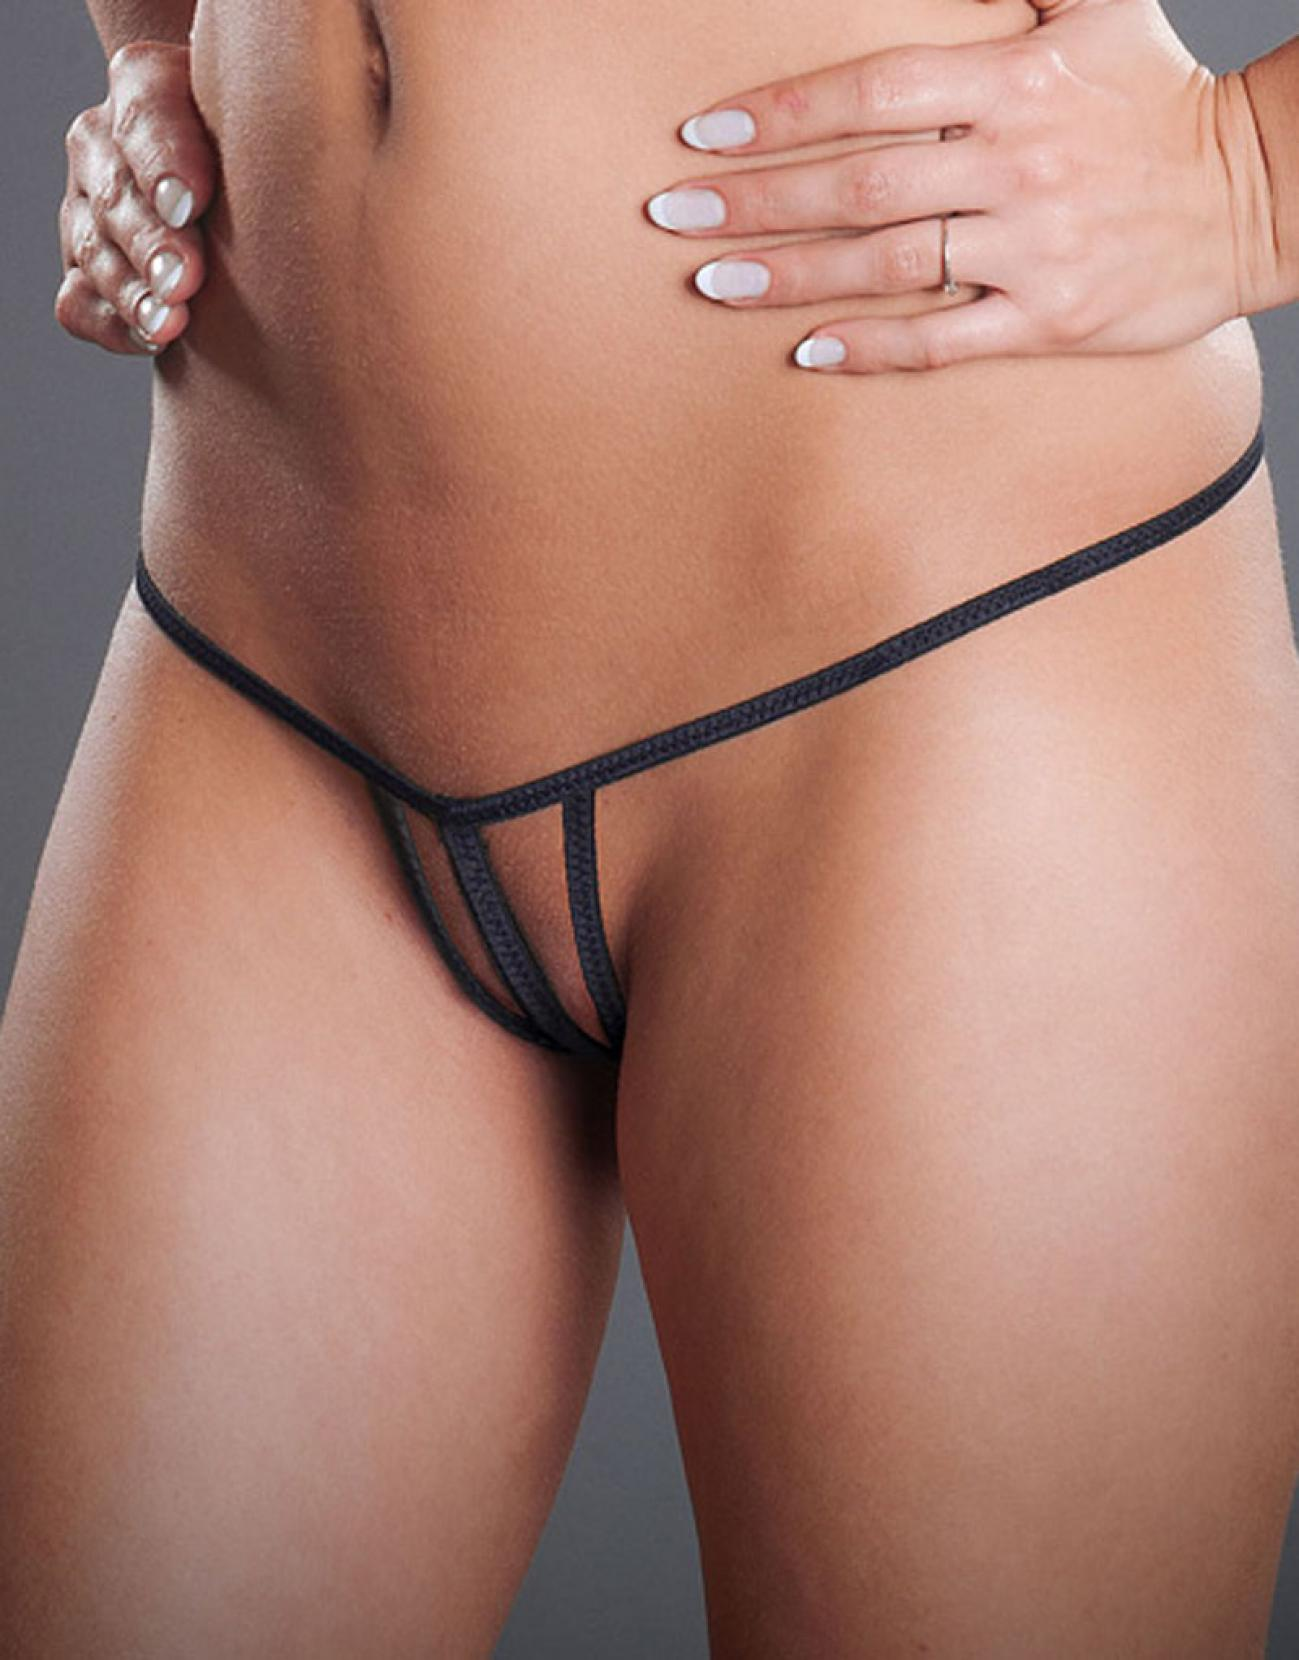 crotchless panty Sexy g string